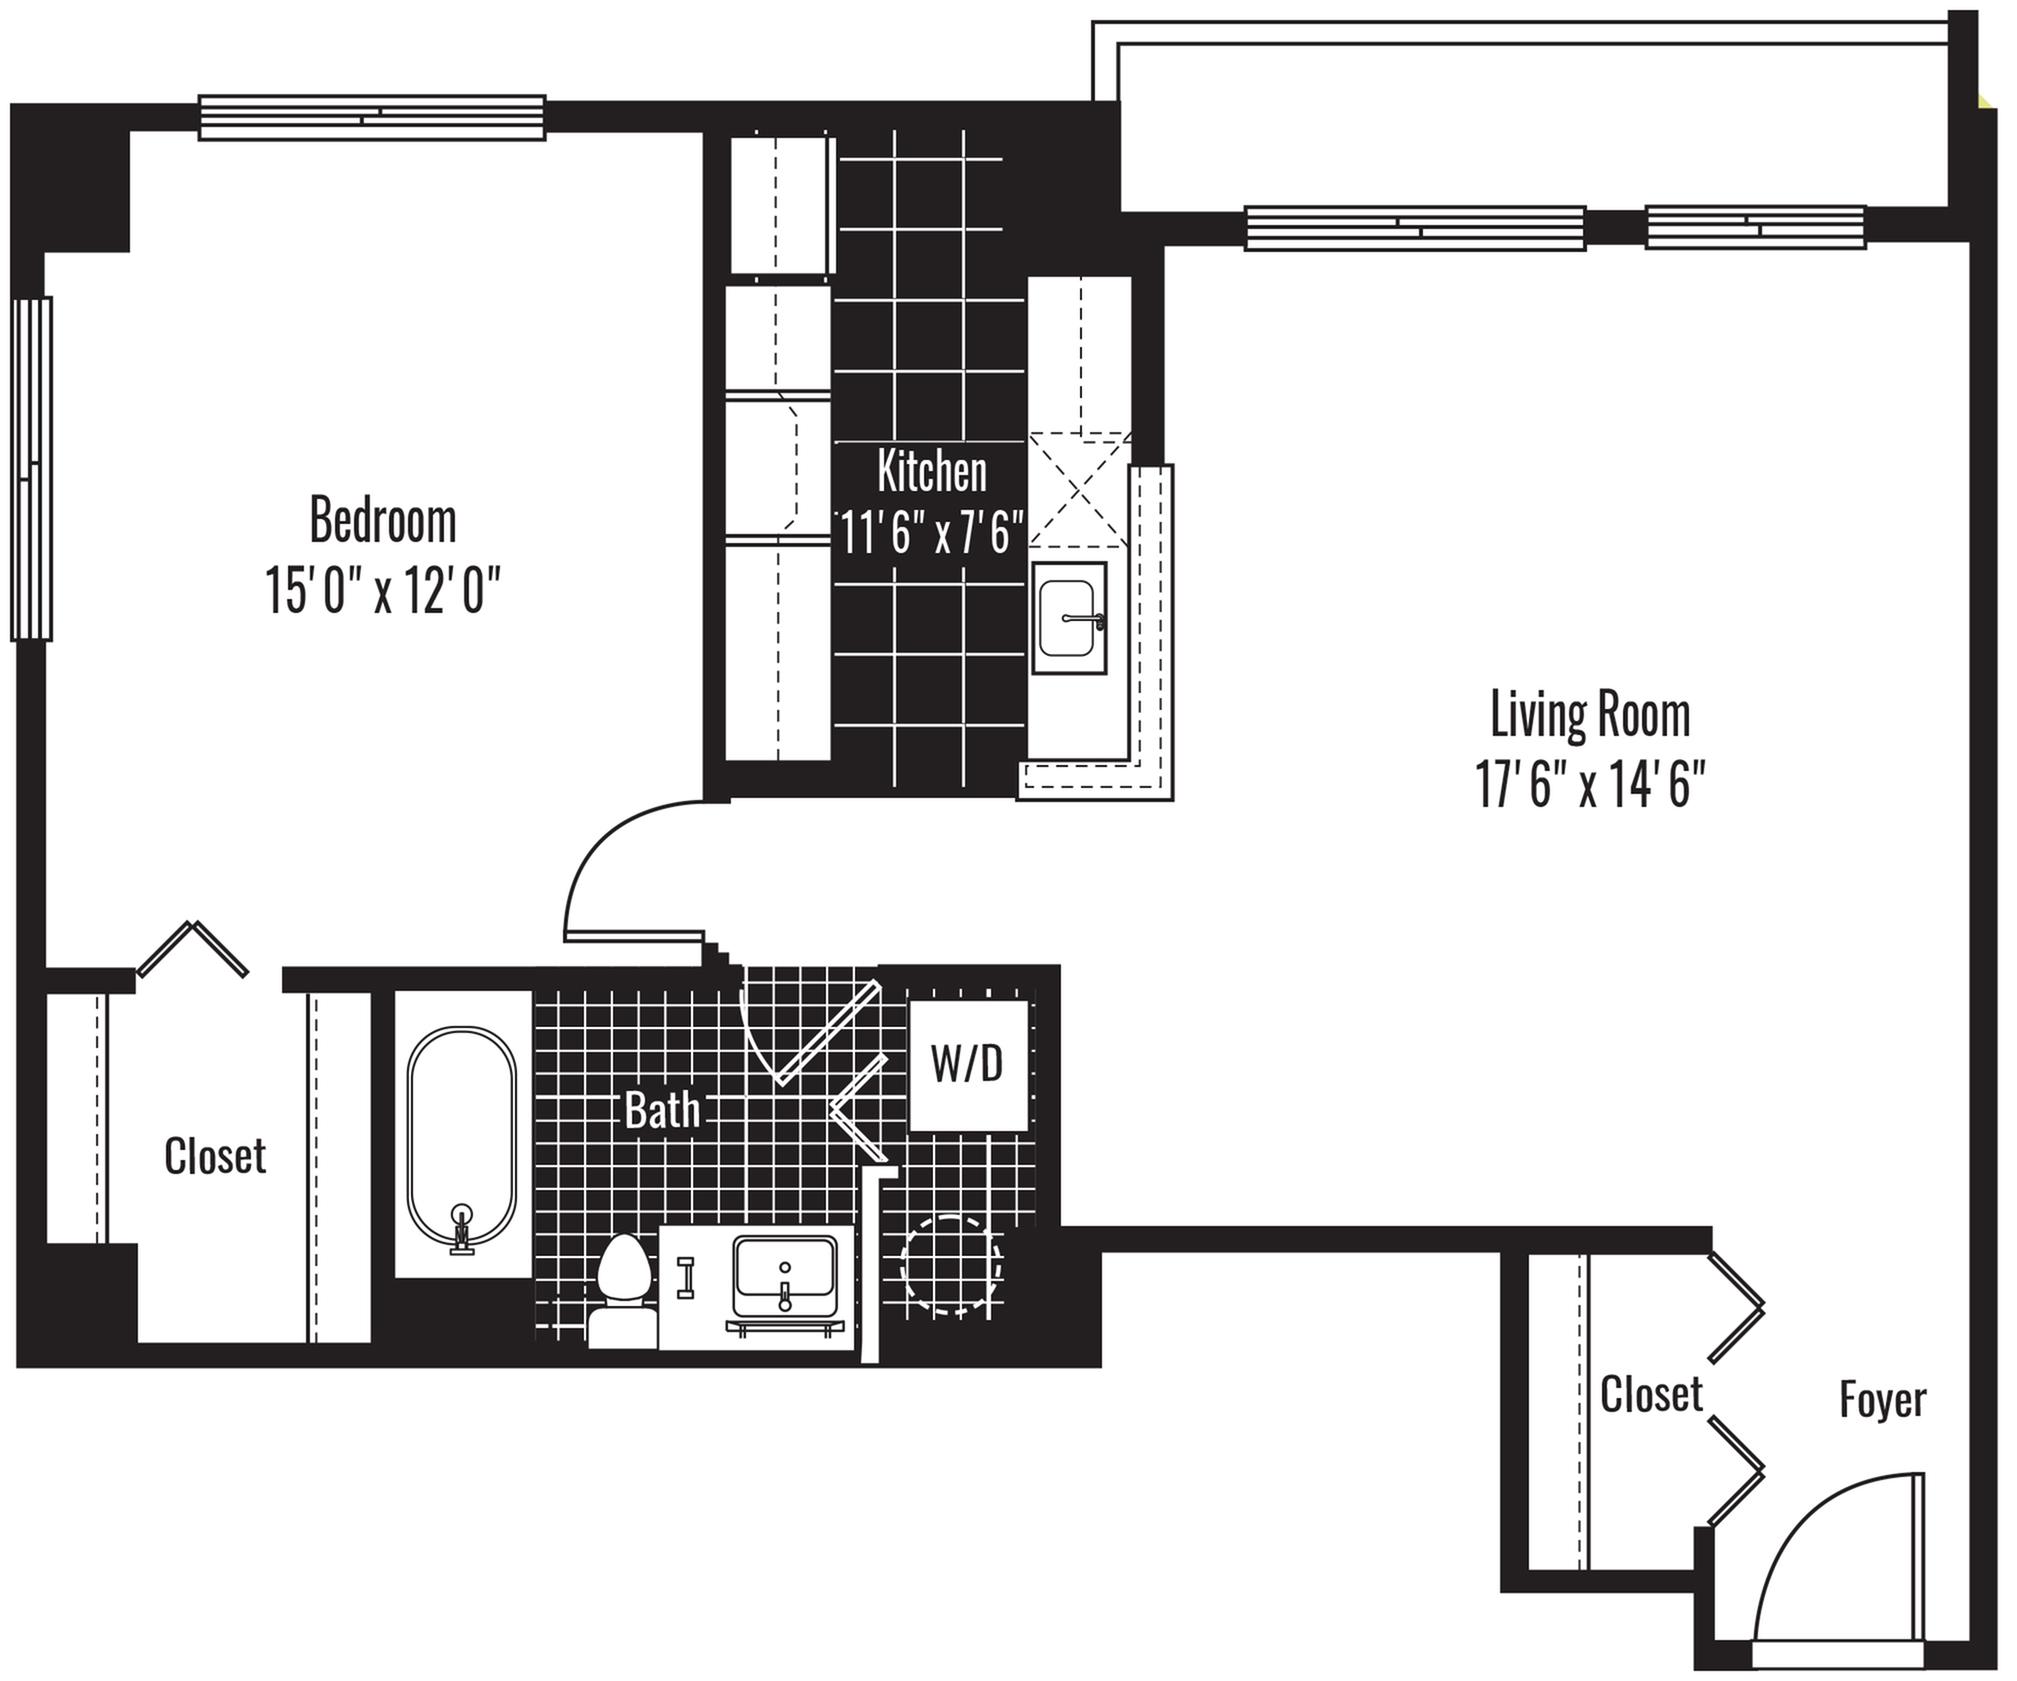 805 square foot one bedroom one bath apartment floorplan image